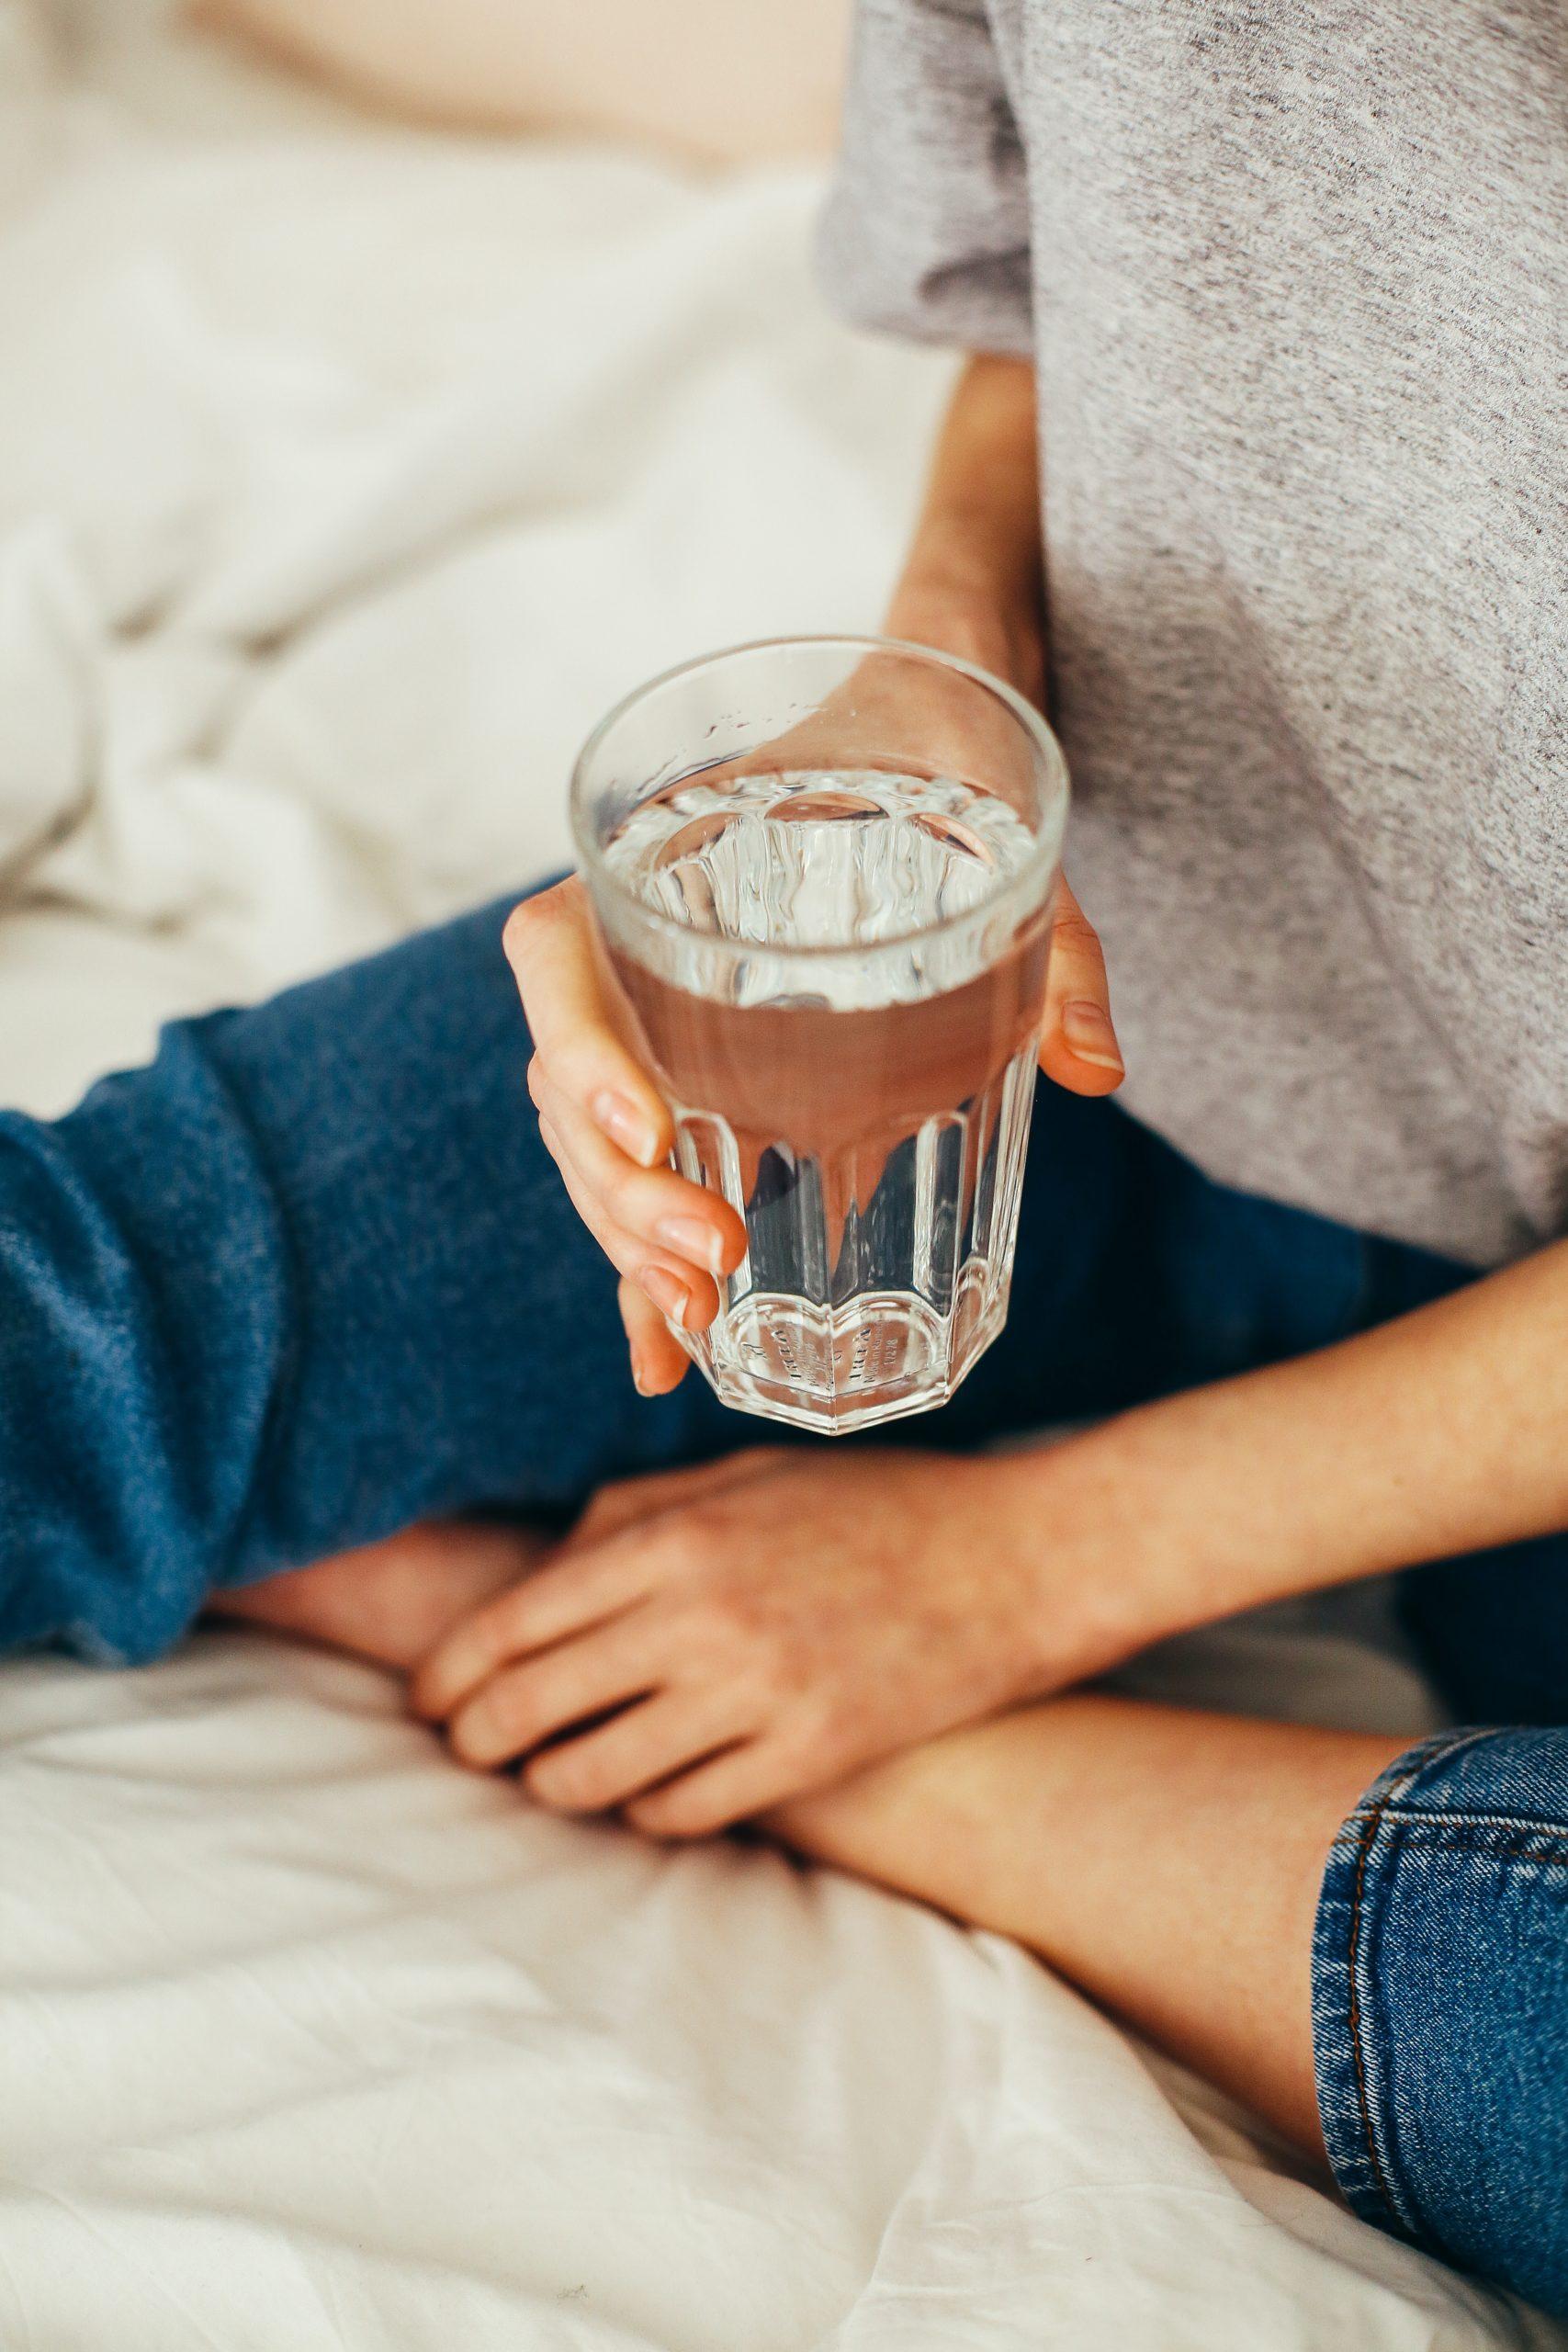 Water-as-a-weight-loss-daria-shevtsova